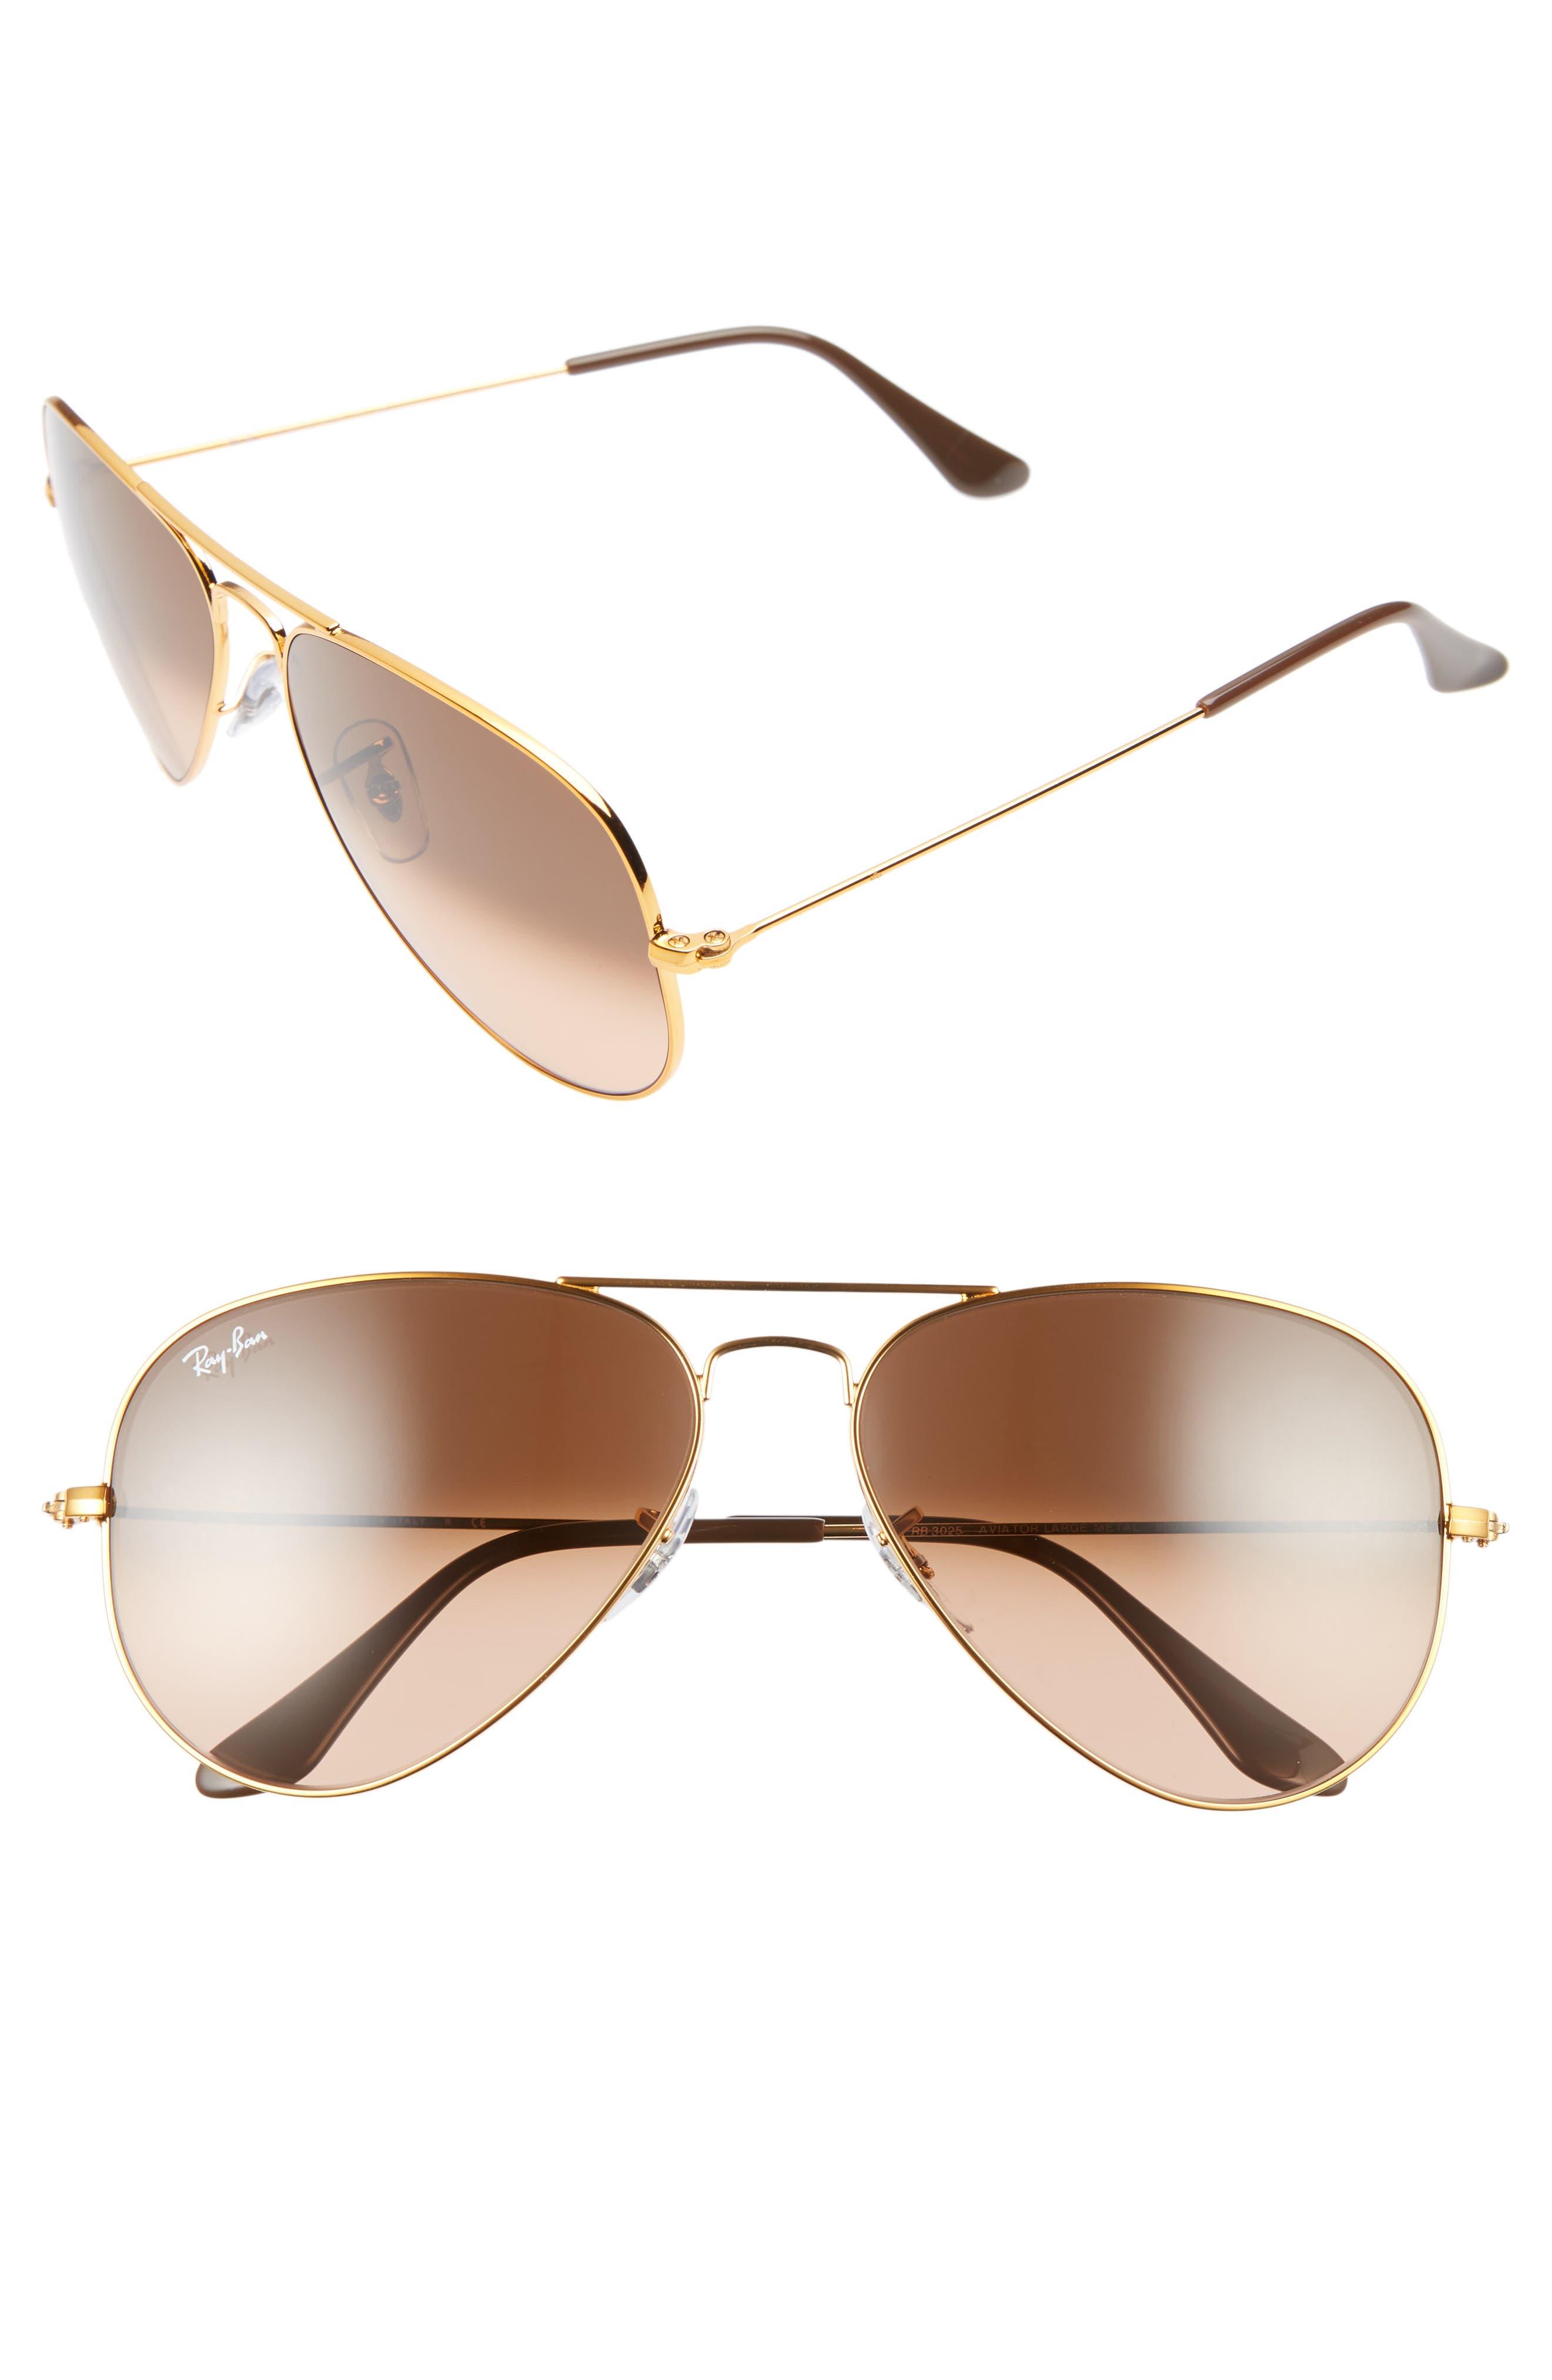 cheap adidas sunglasses womens